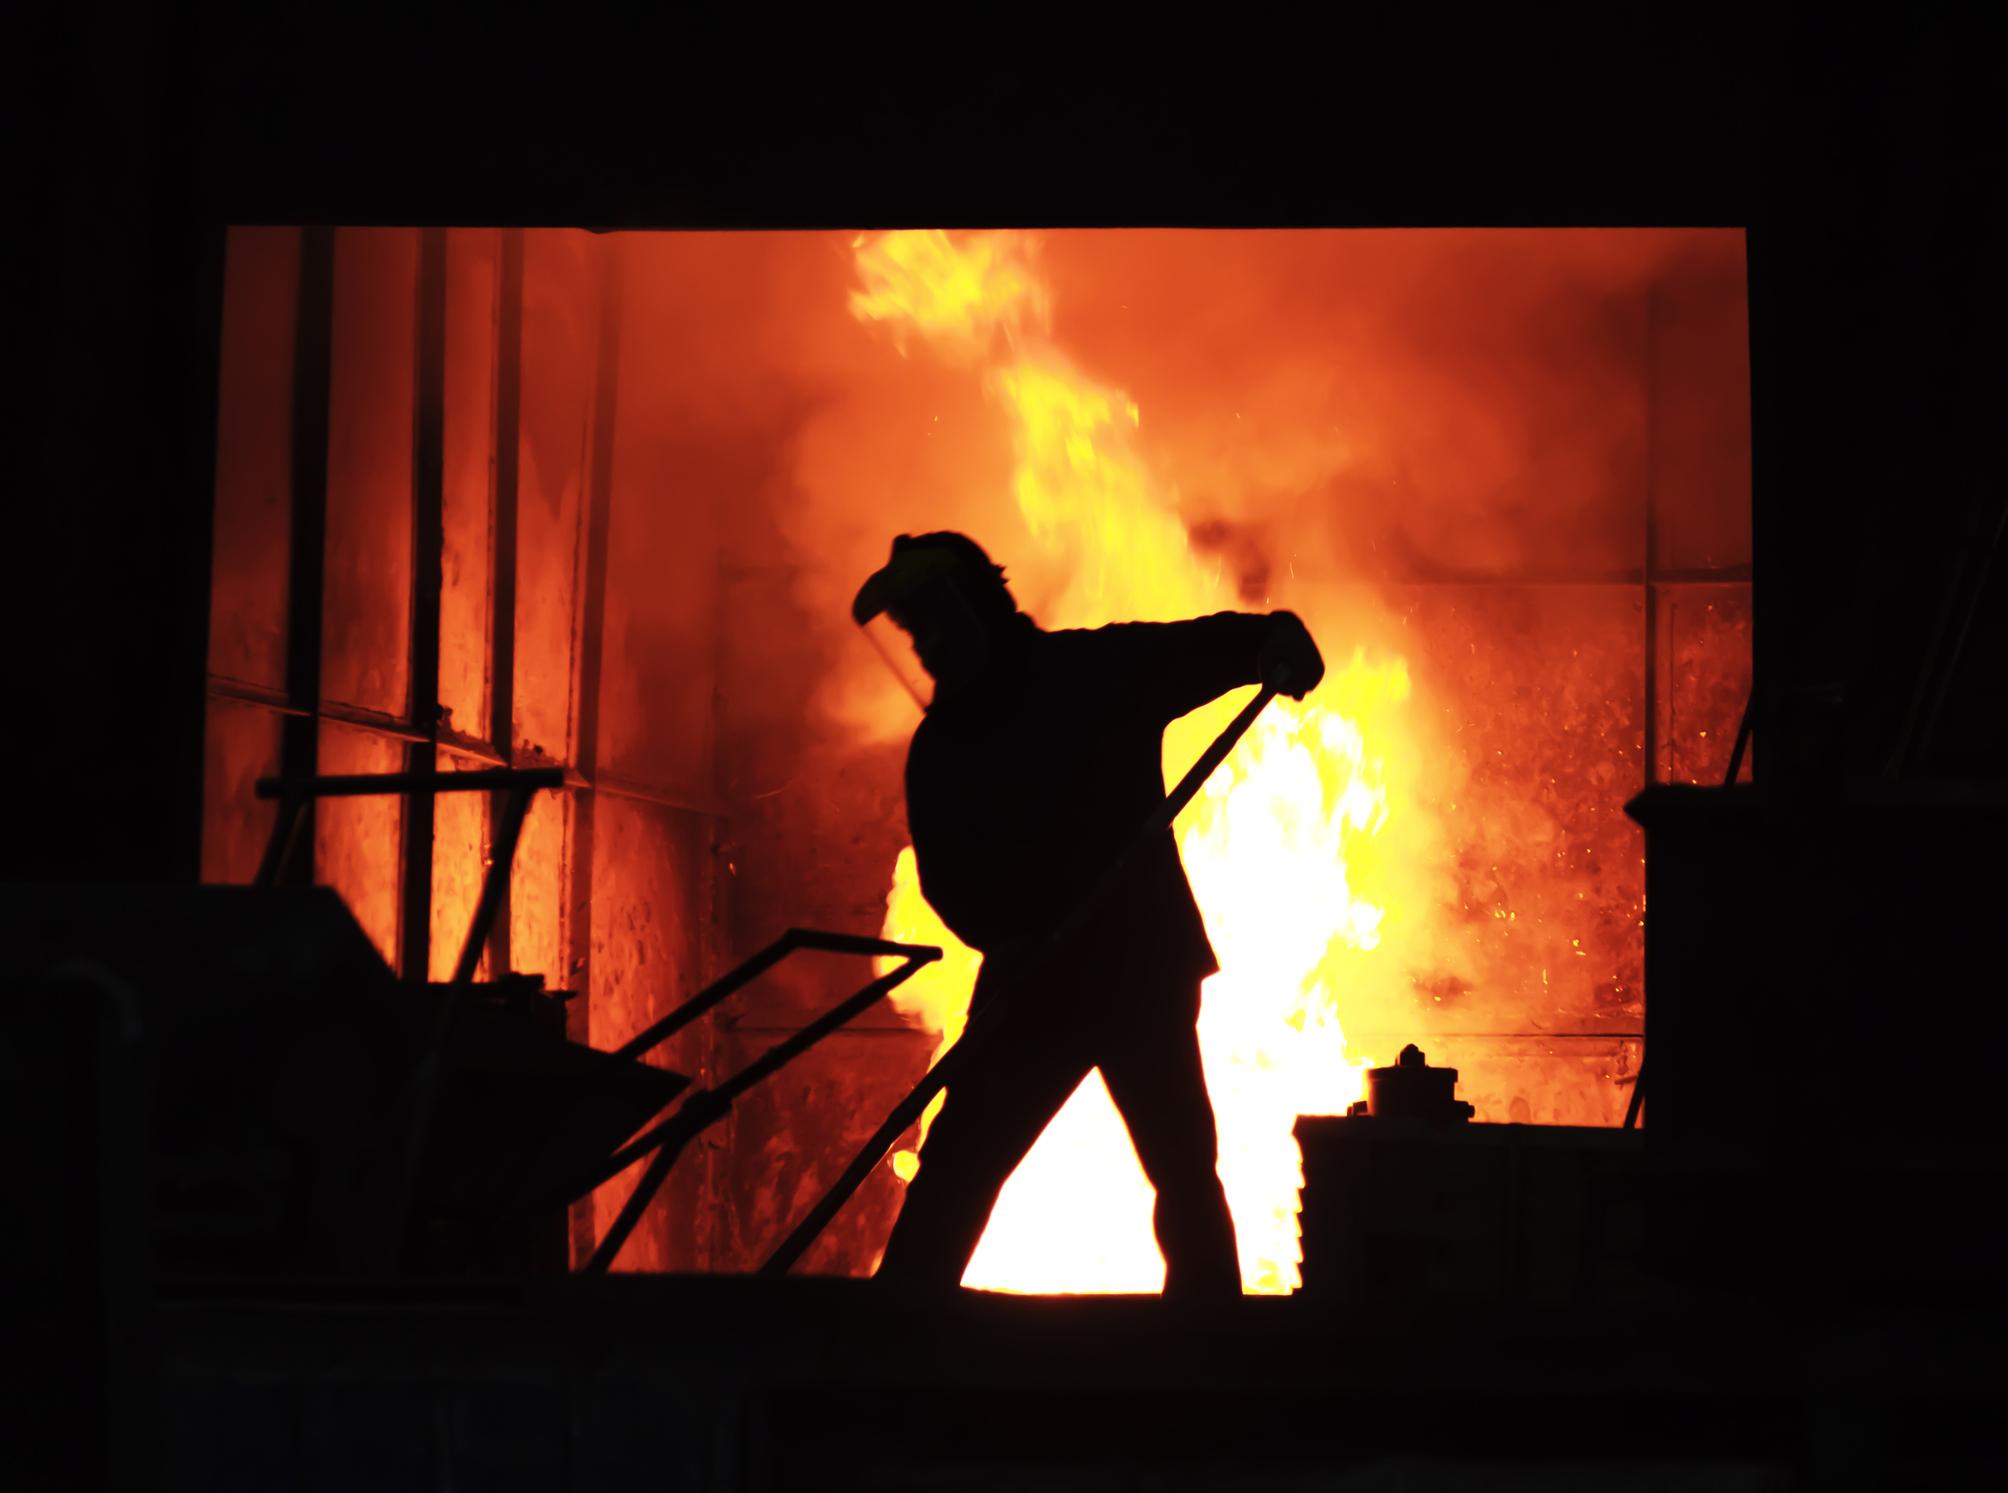 man working with molten iron